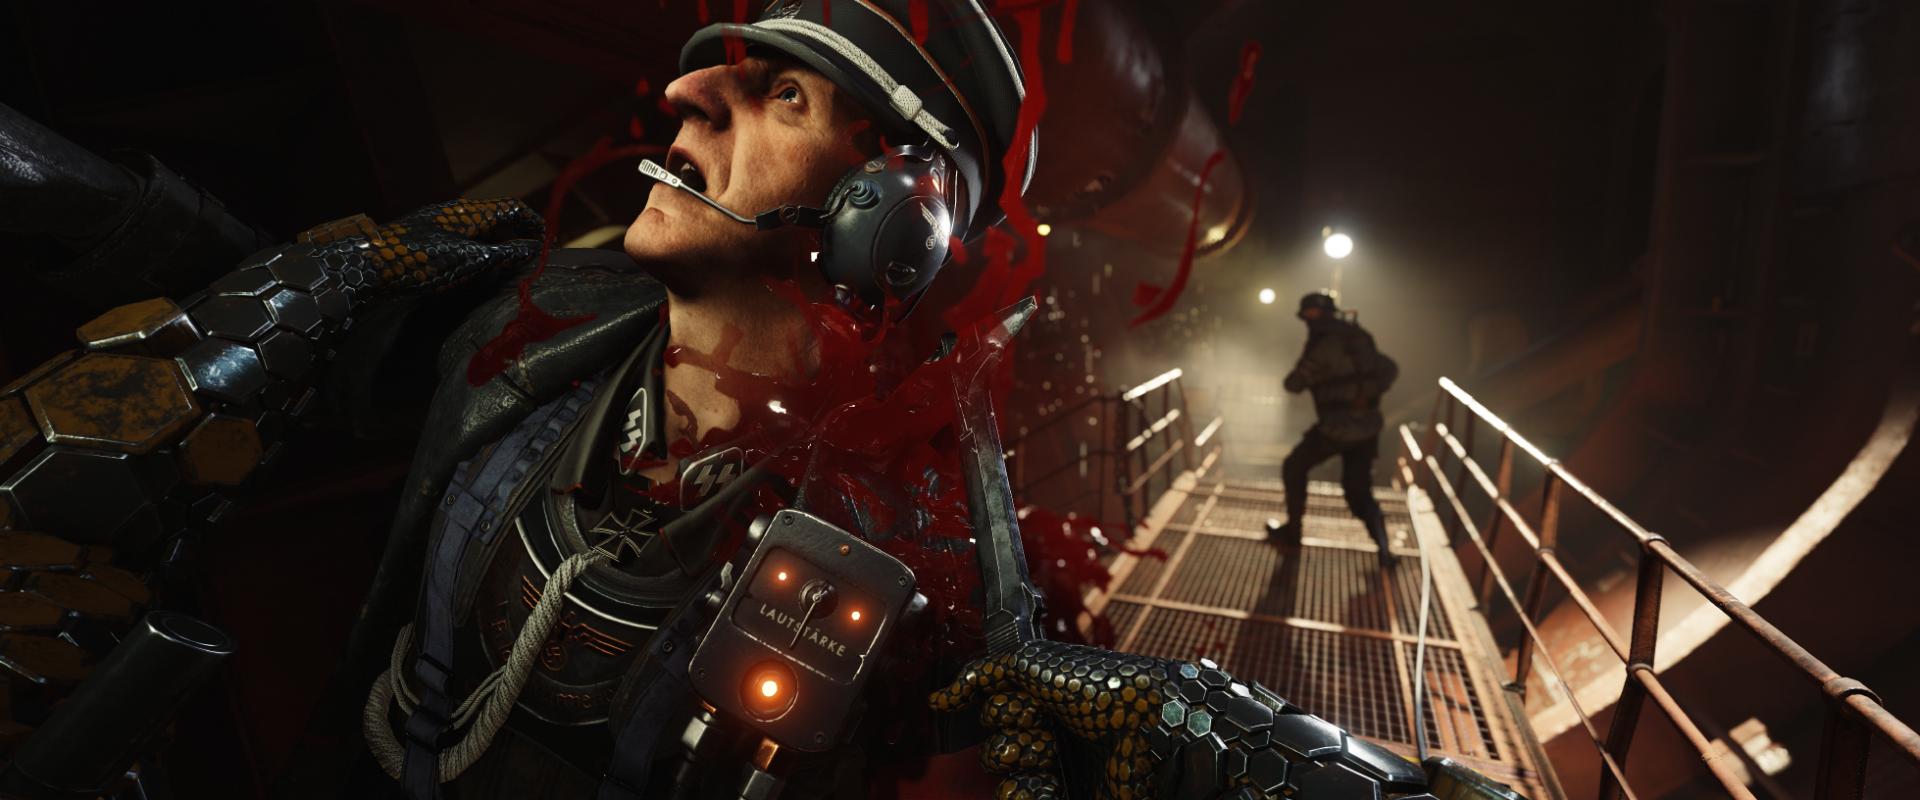 E3 2017 Bethesda Land: Wolfenstein 2 The New Colossus Announced!